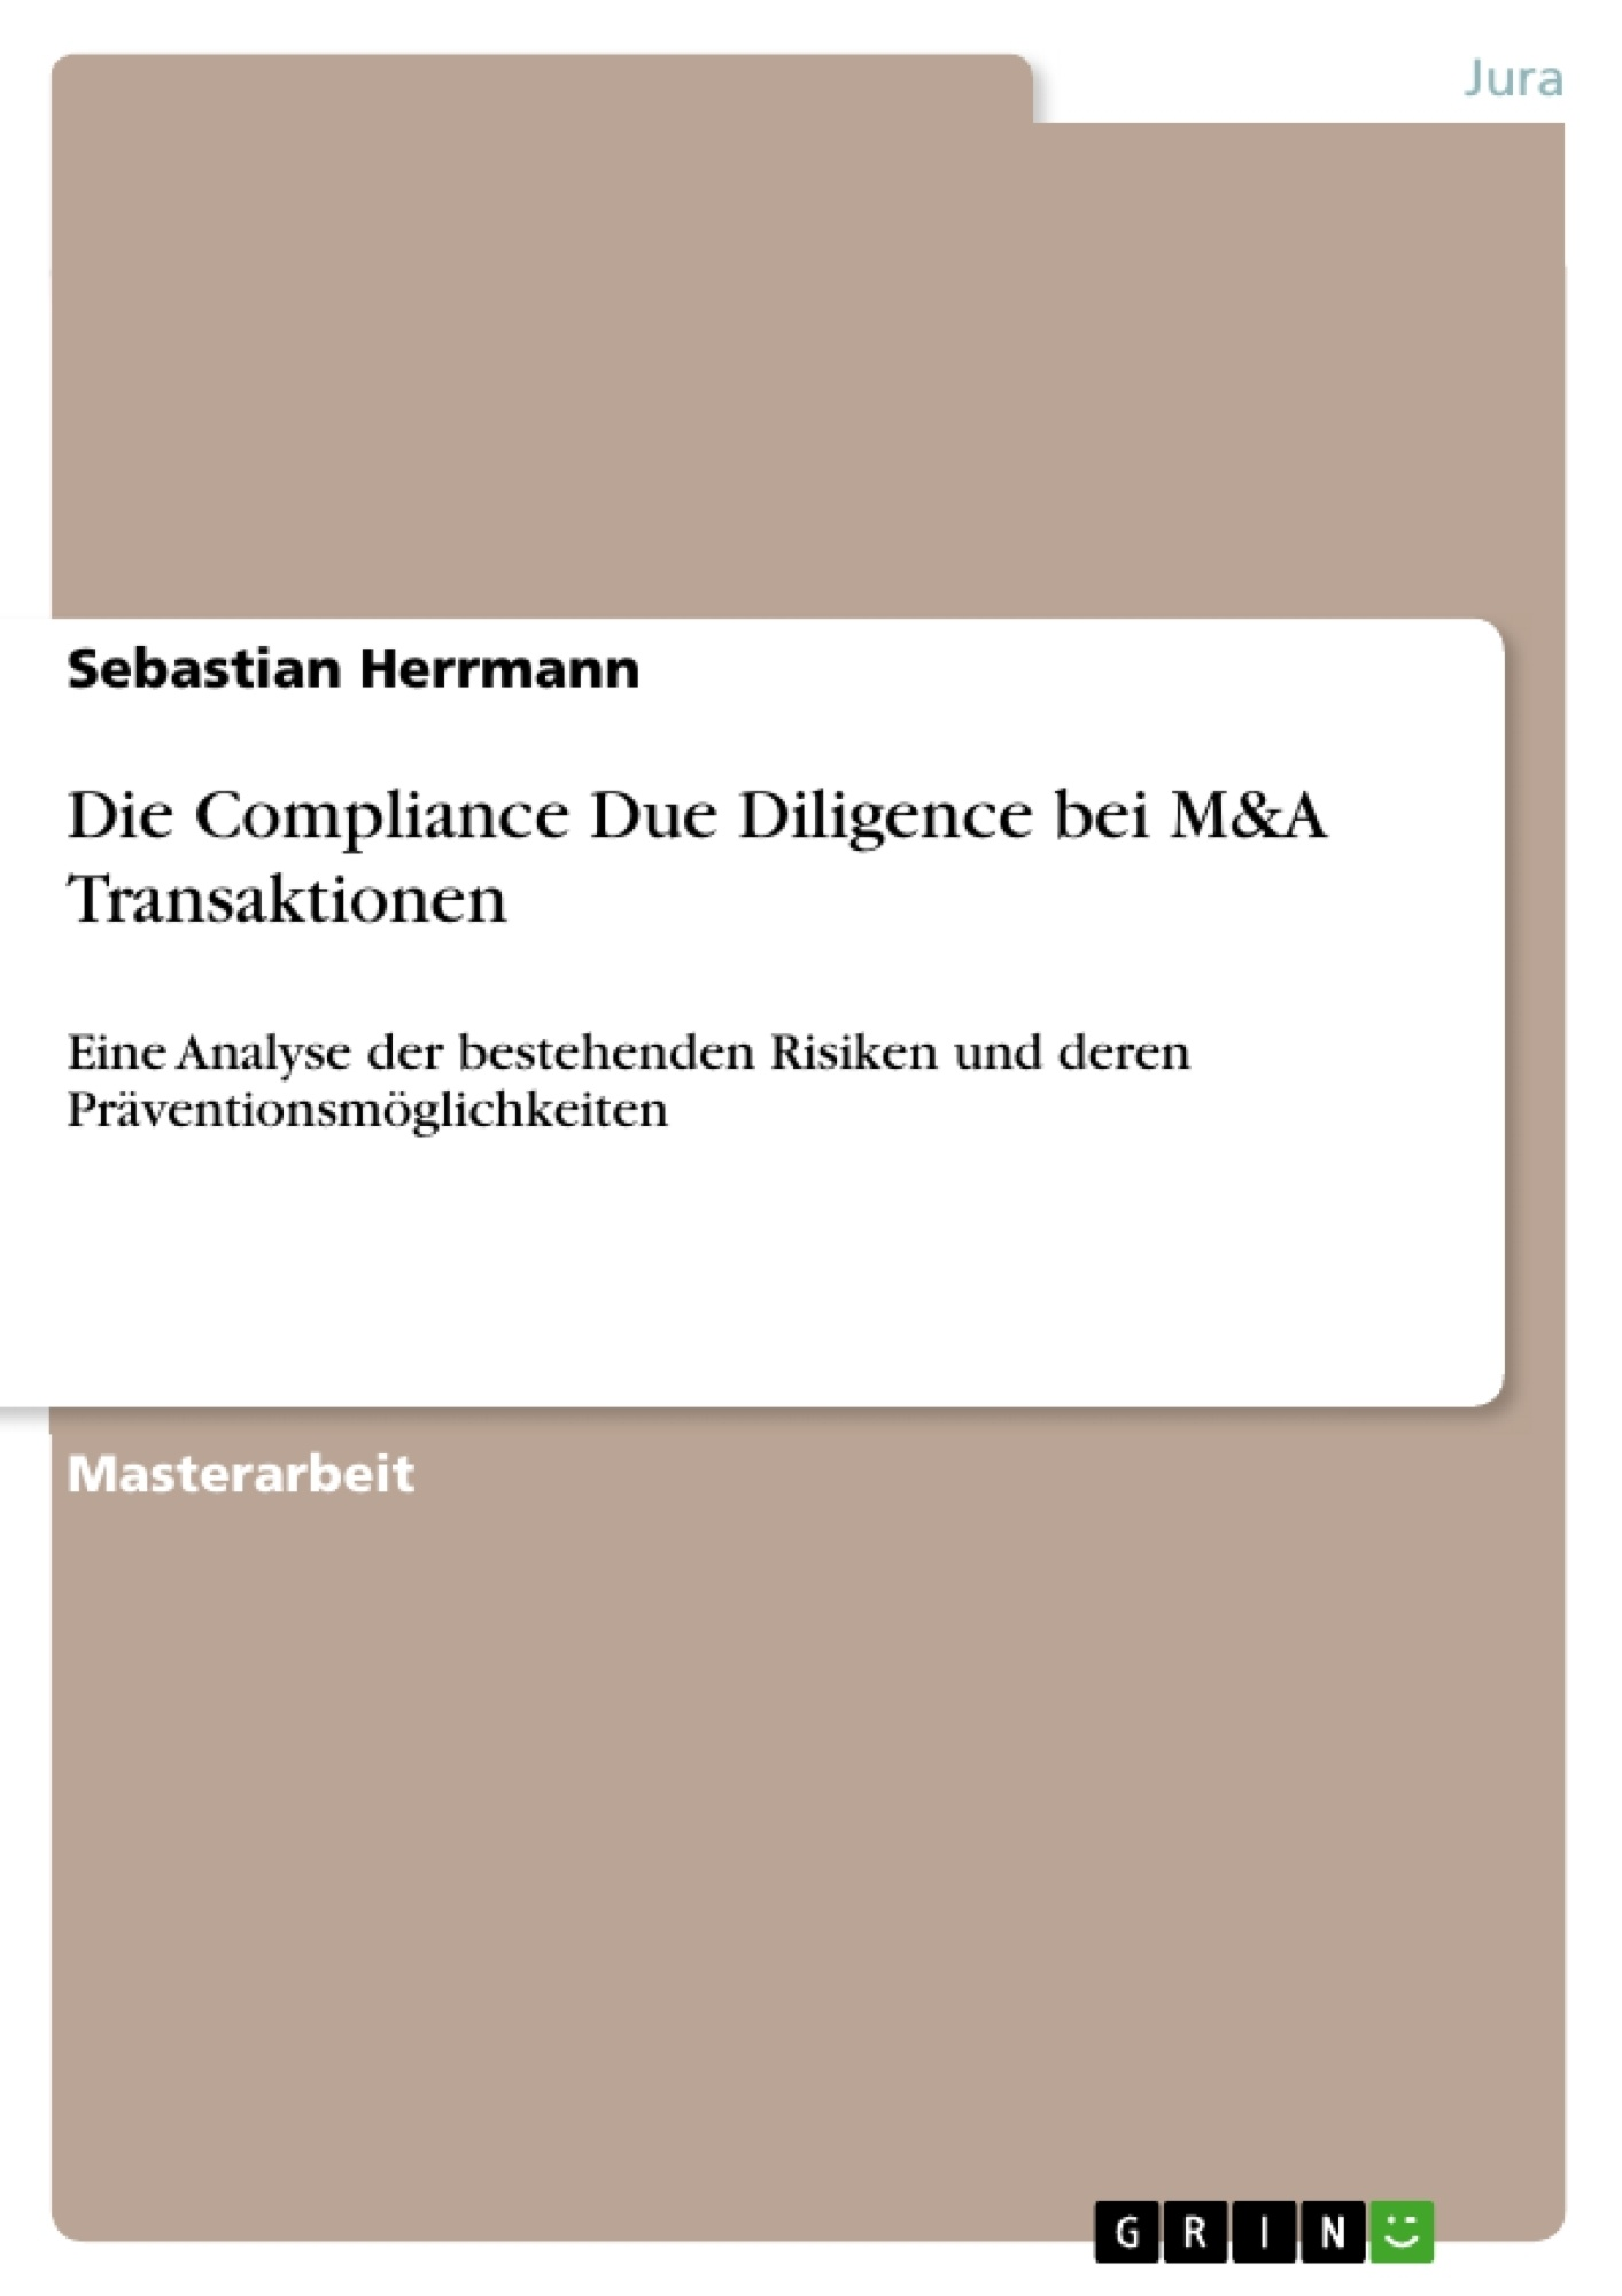 Titel: Die Compliance Due Diligence bei M&A Transaktionen